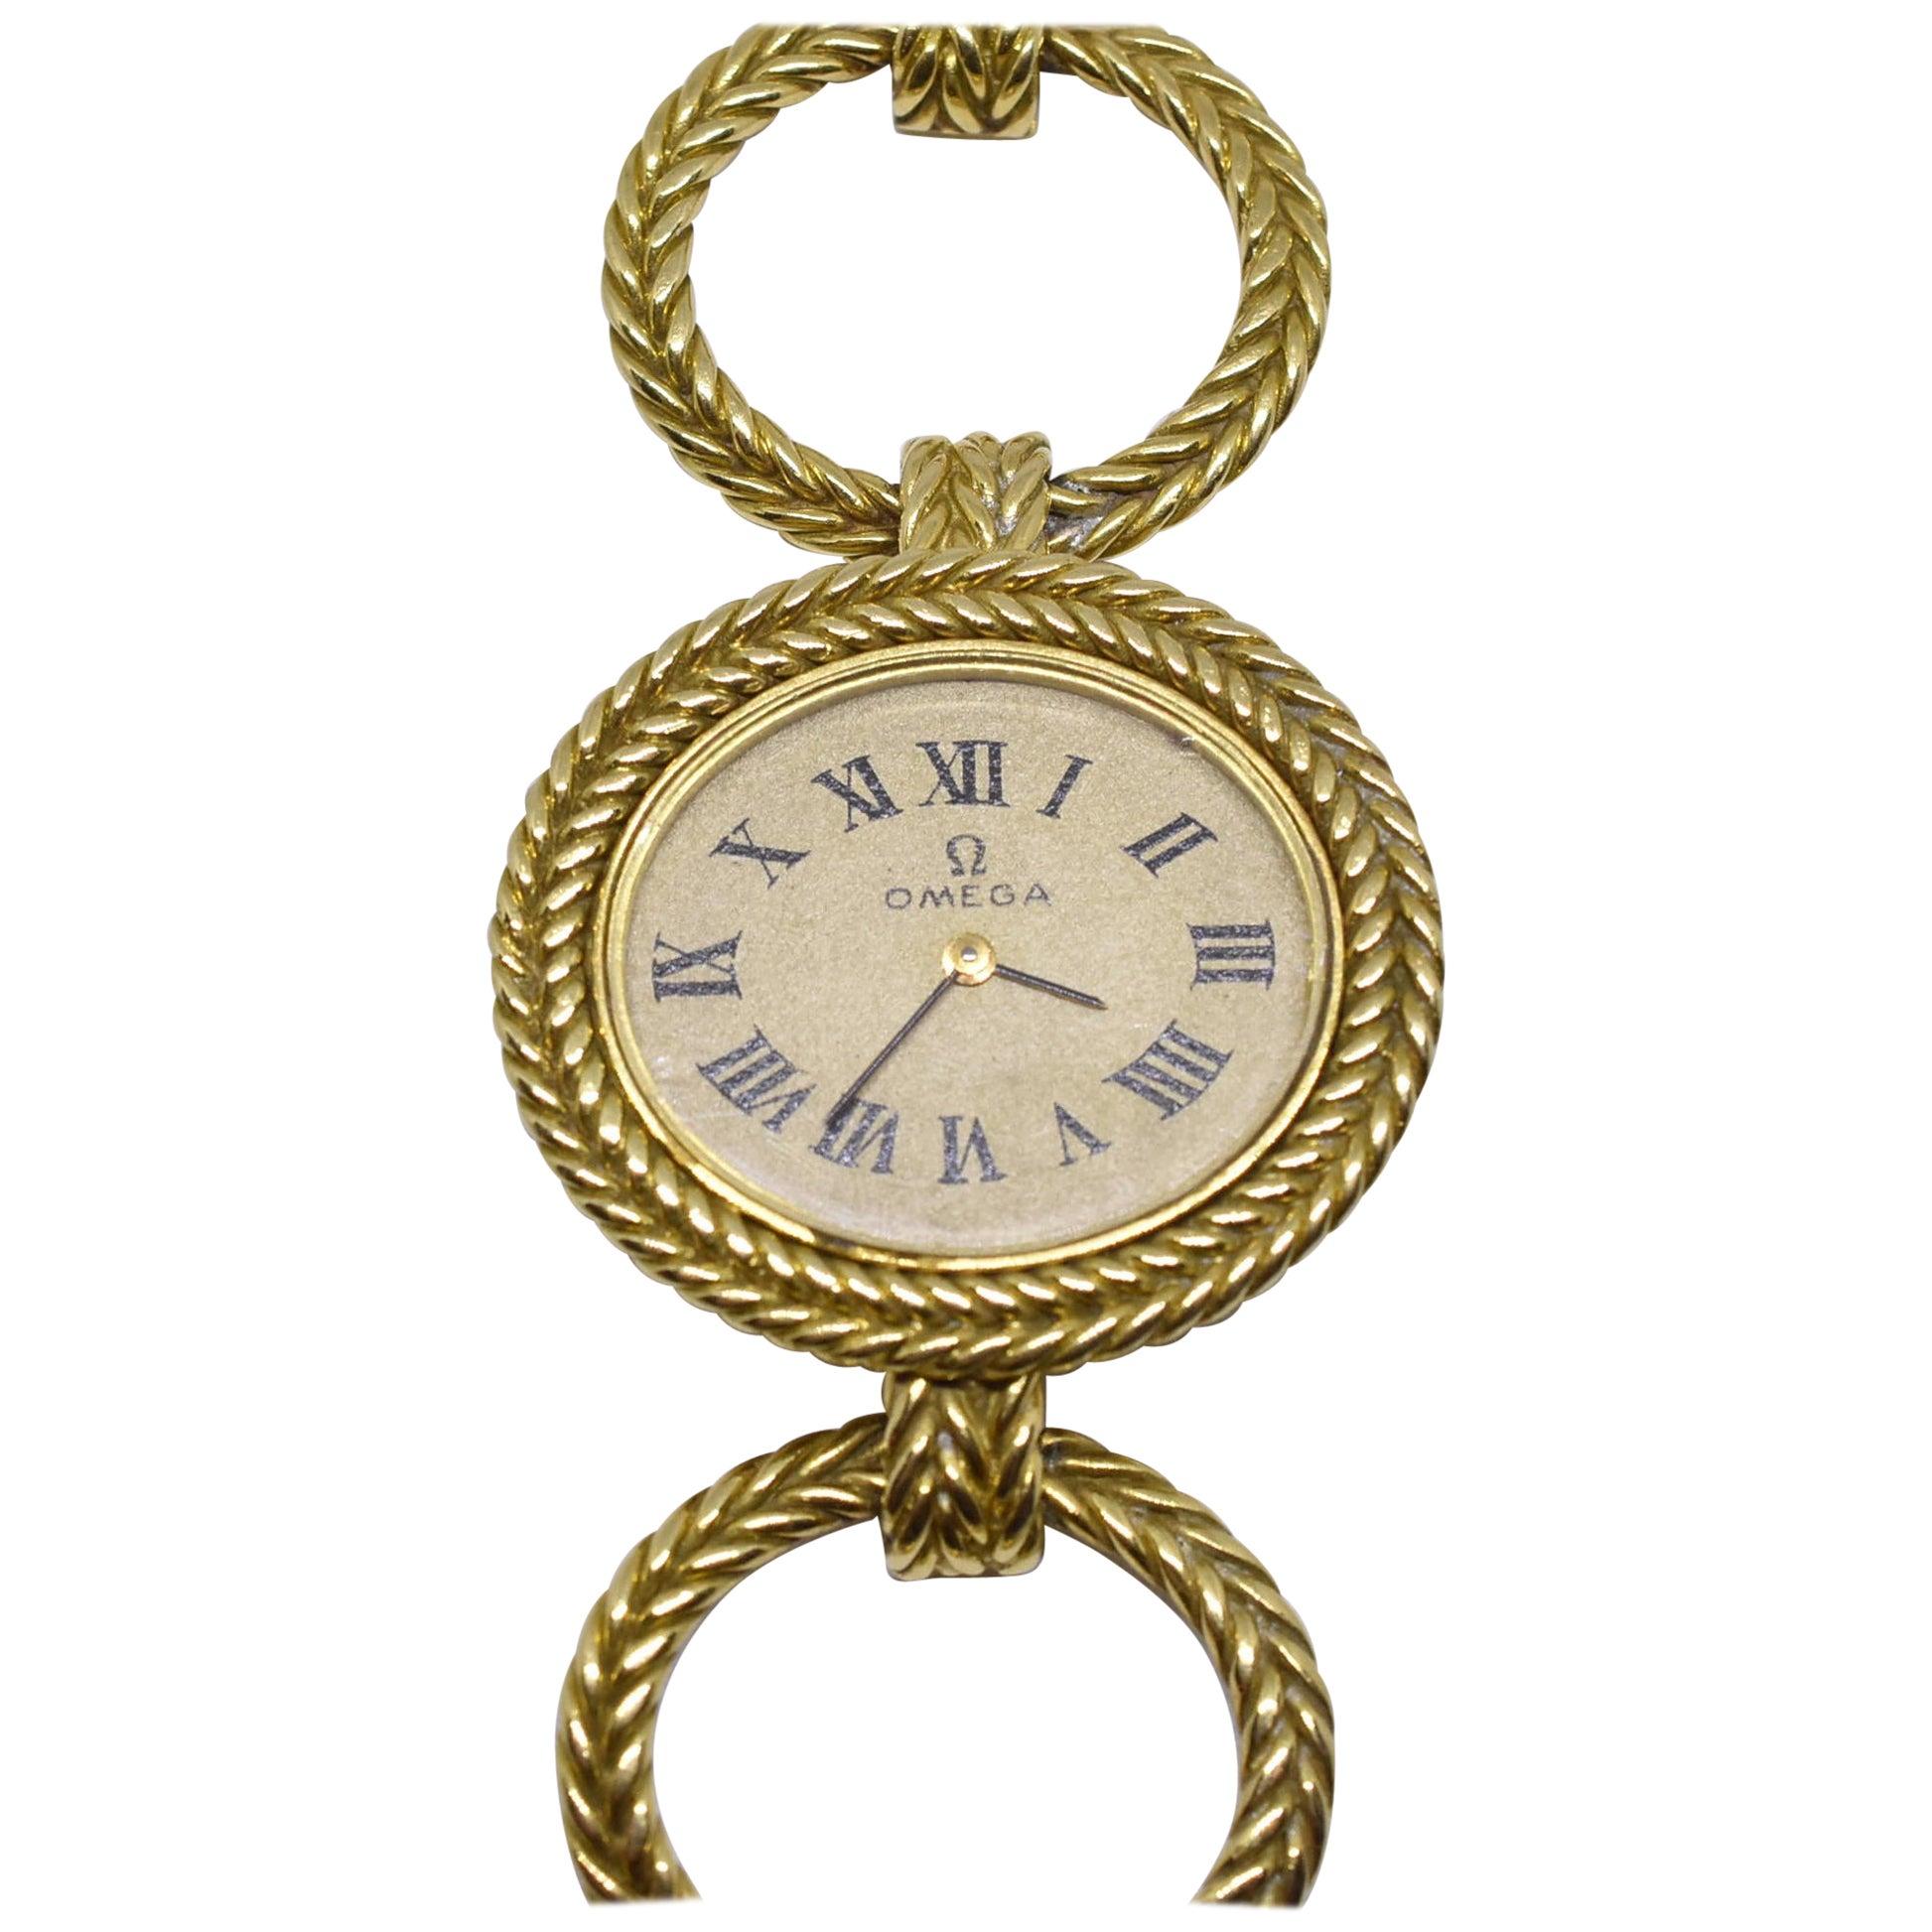 Omega Ladies Watch, 18-Karat Oval Gold Linked Bracelet Braided Design